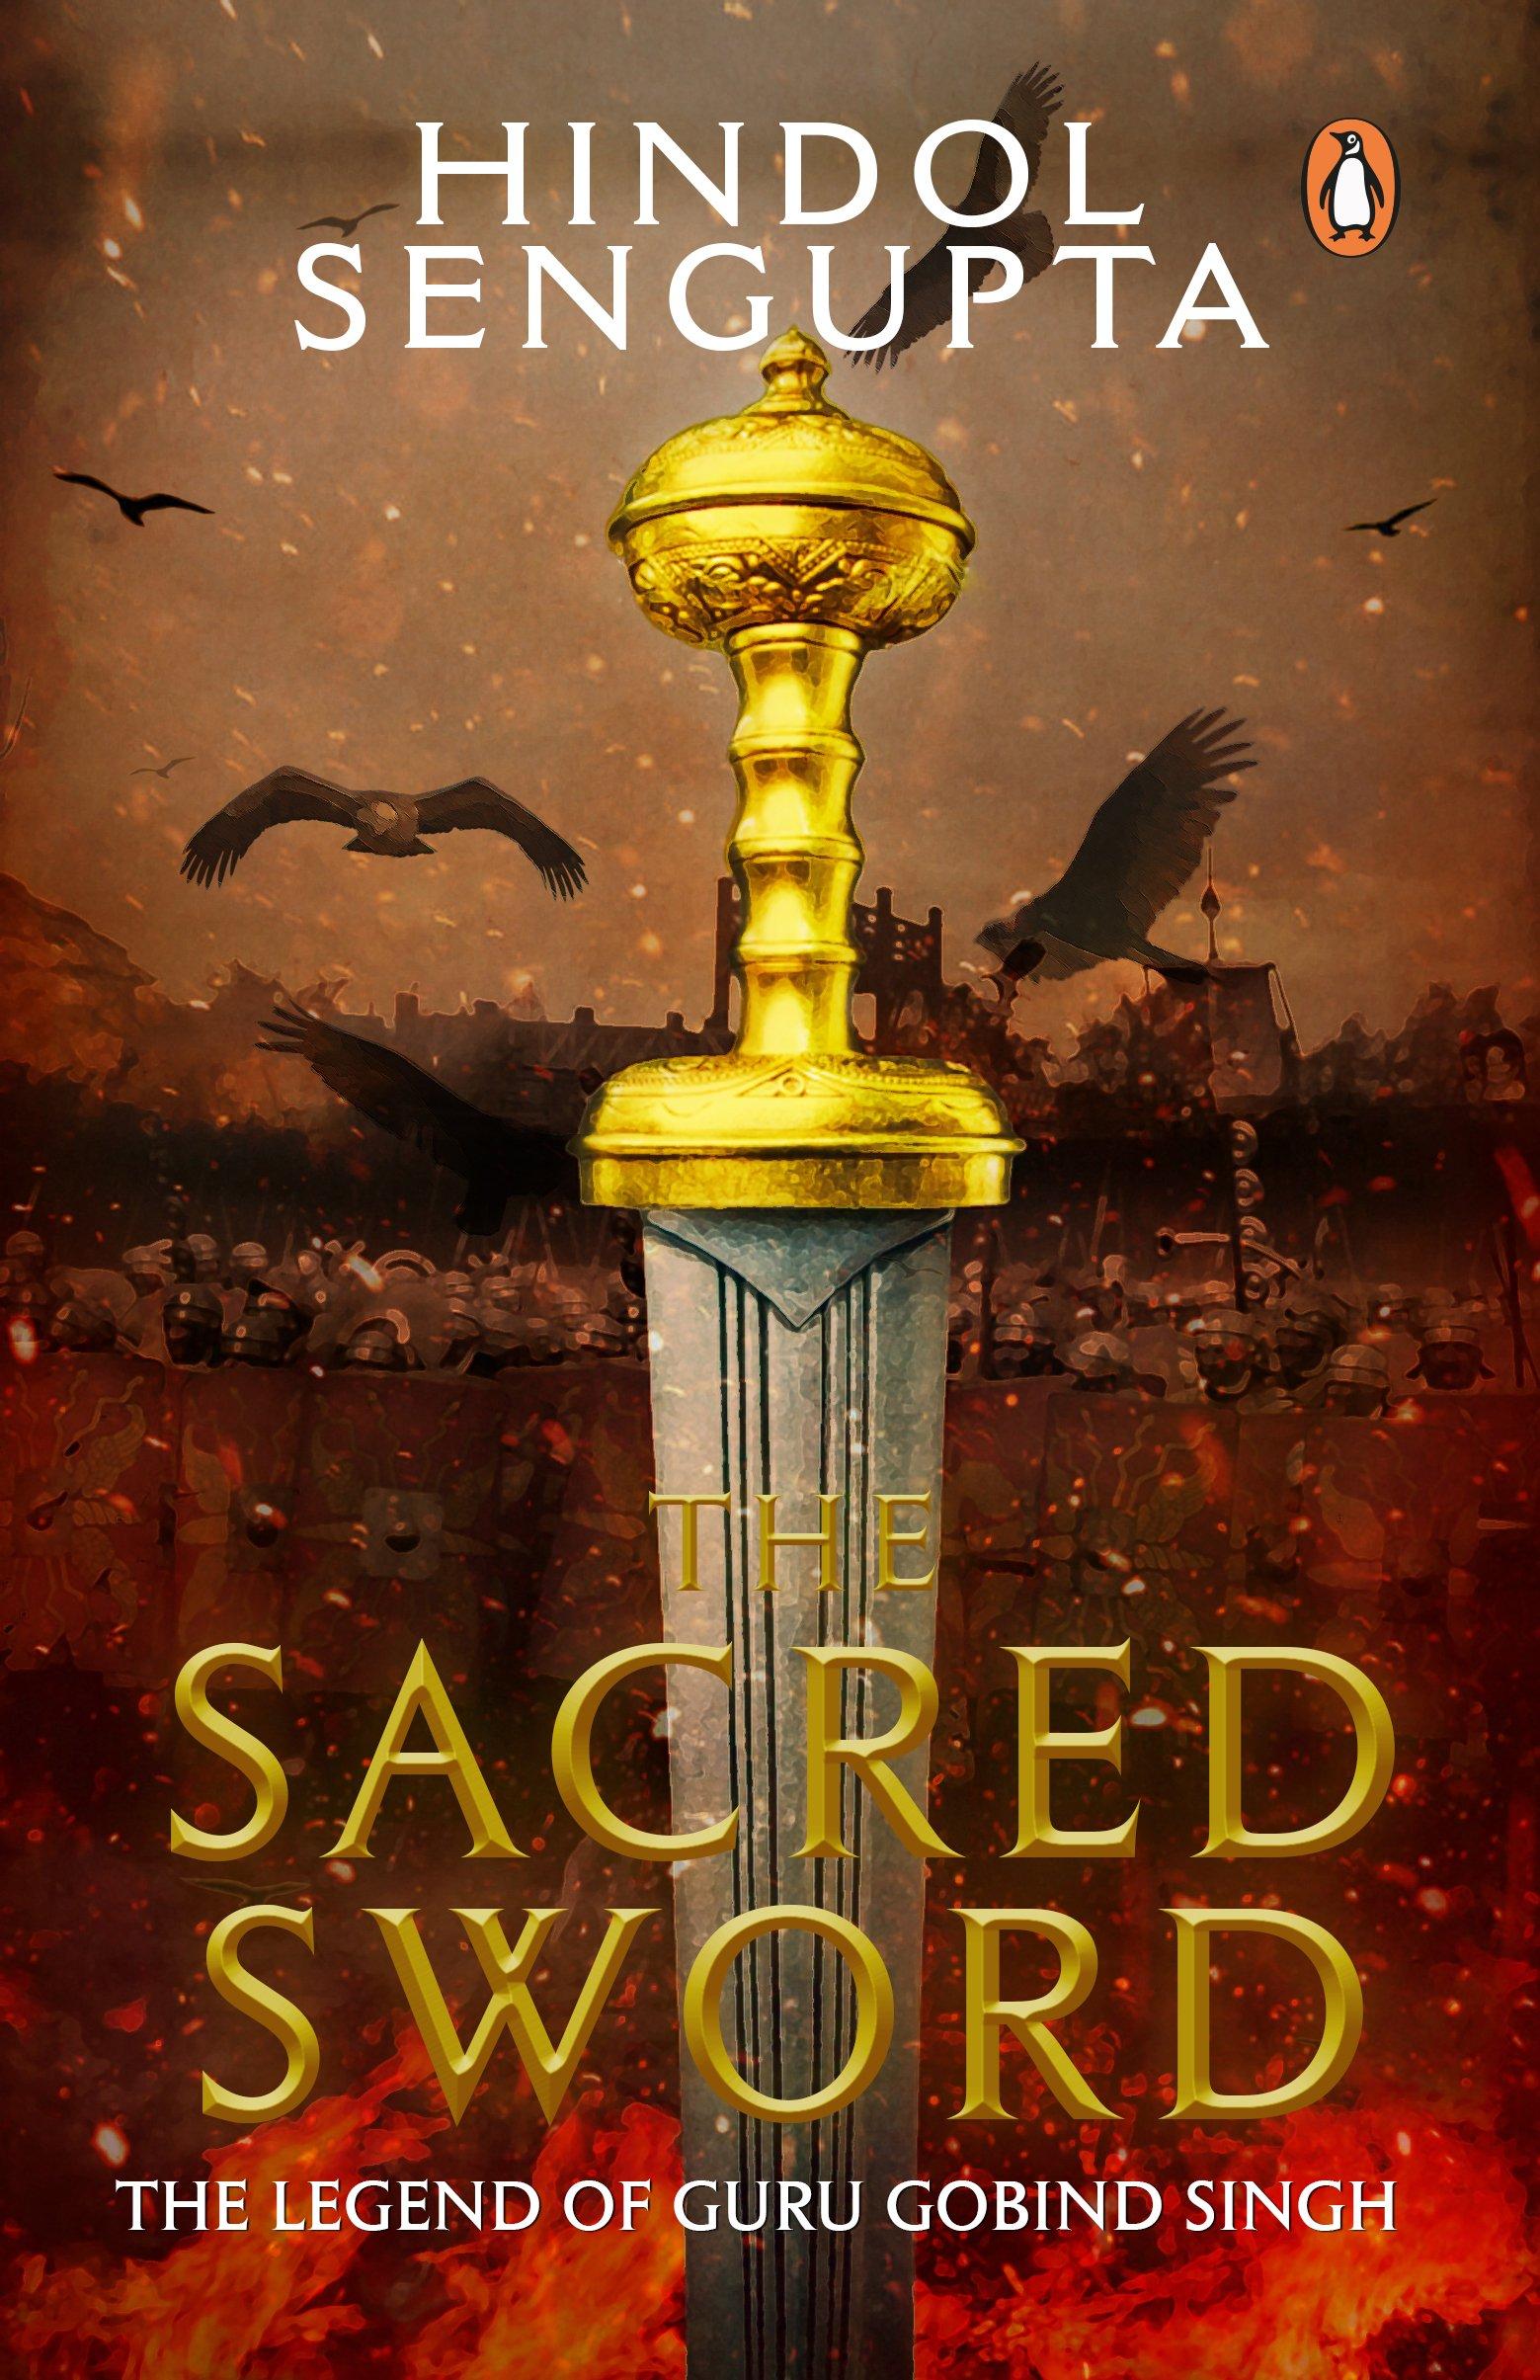 Buy The Sacred Sword The Legend Of Guru Gobind Singh Book Online At